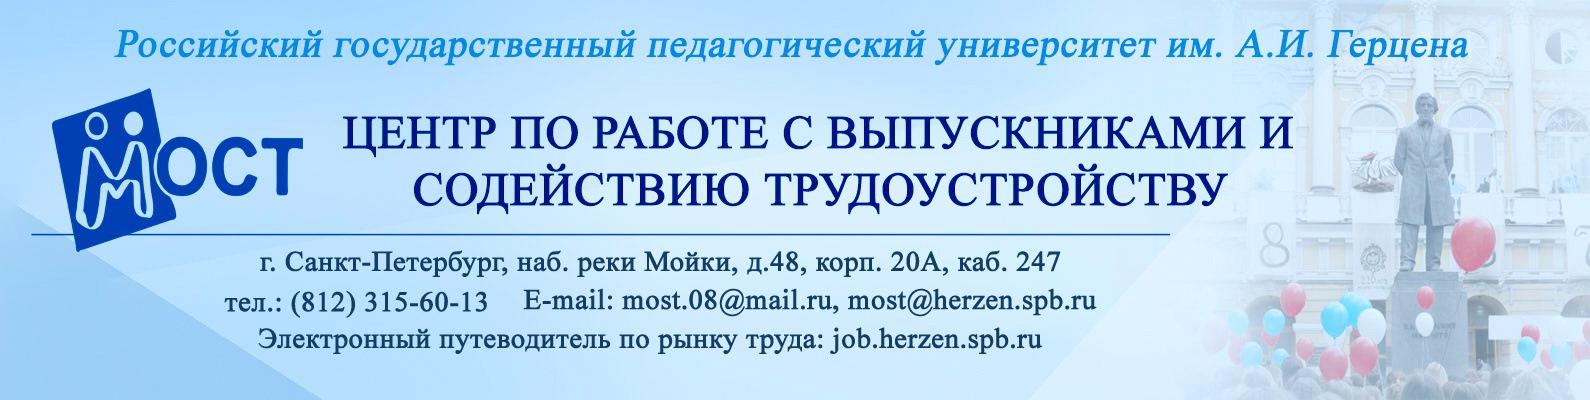 Работа мейл ру спб